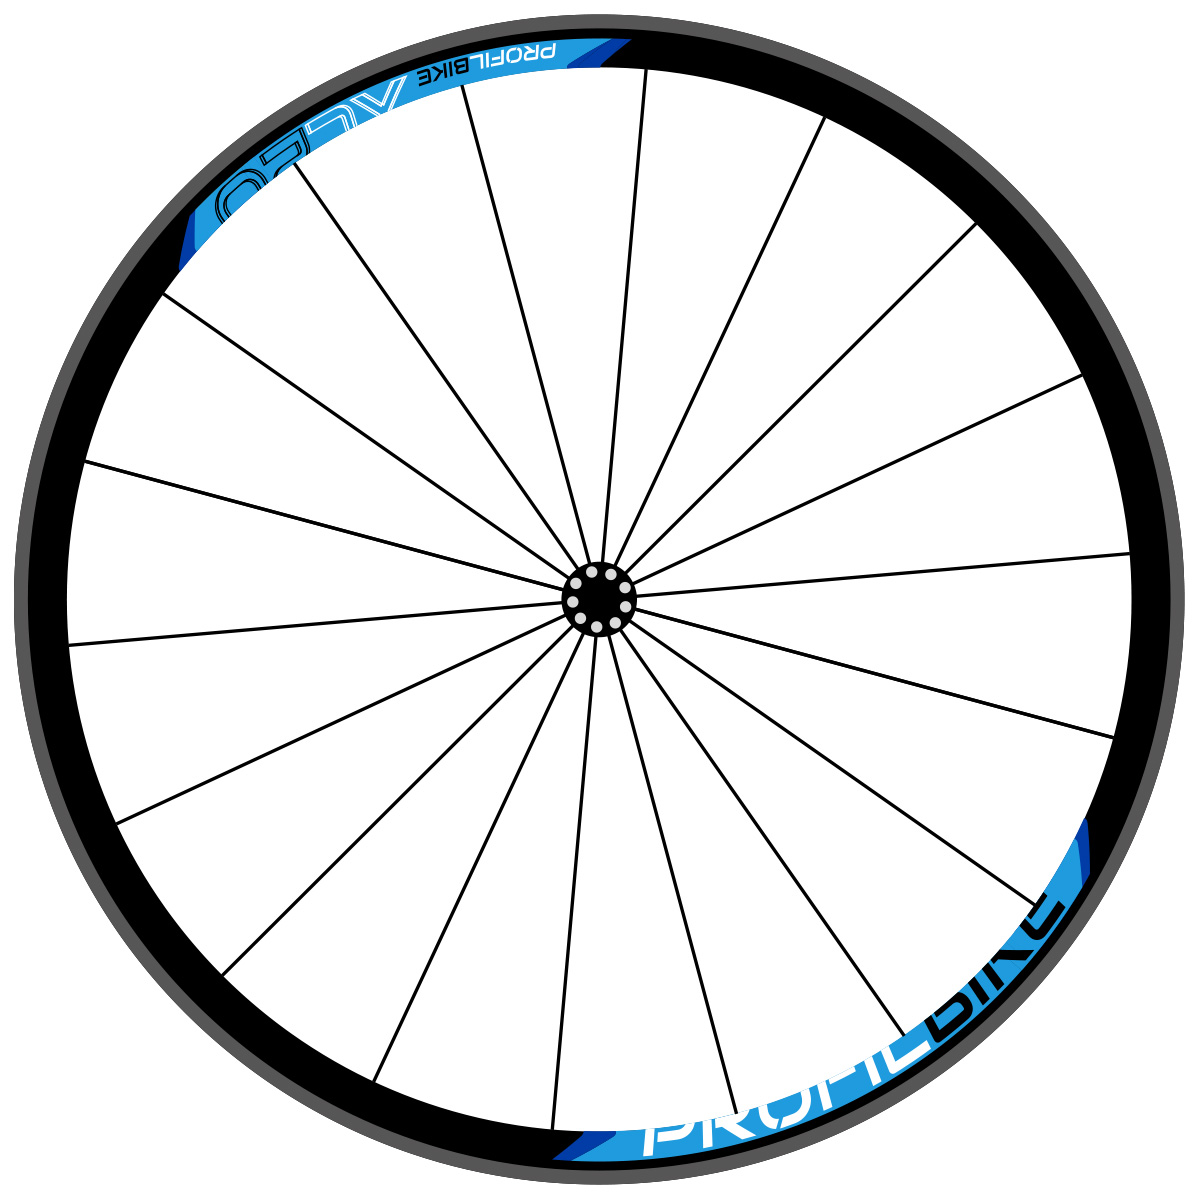 Profilbike XC20 design bleu